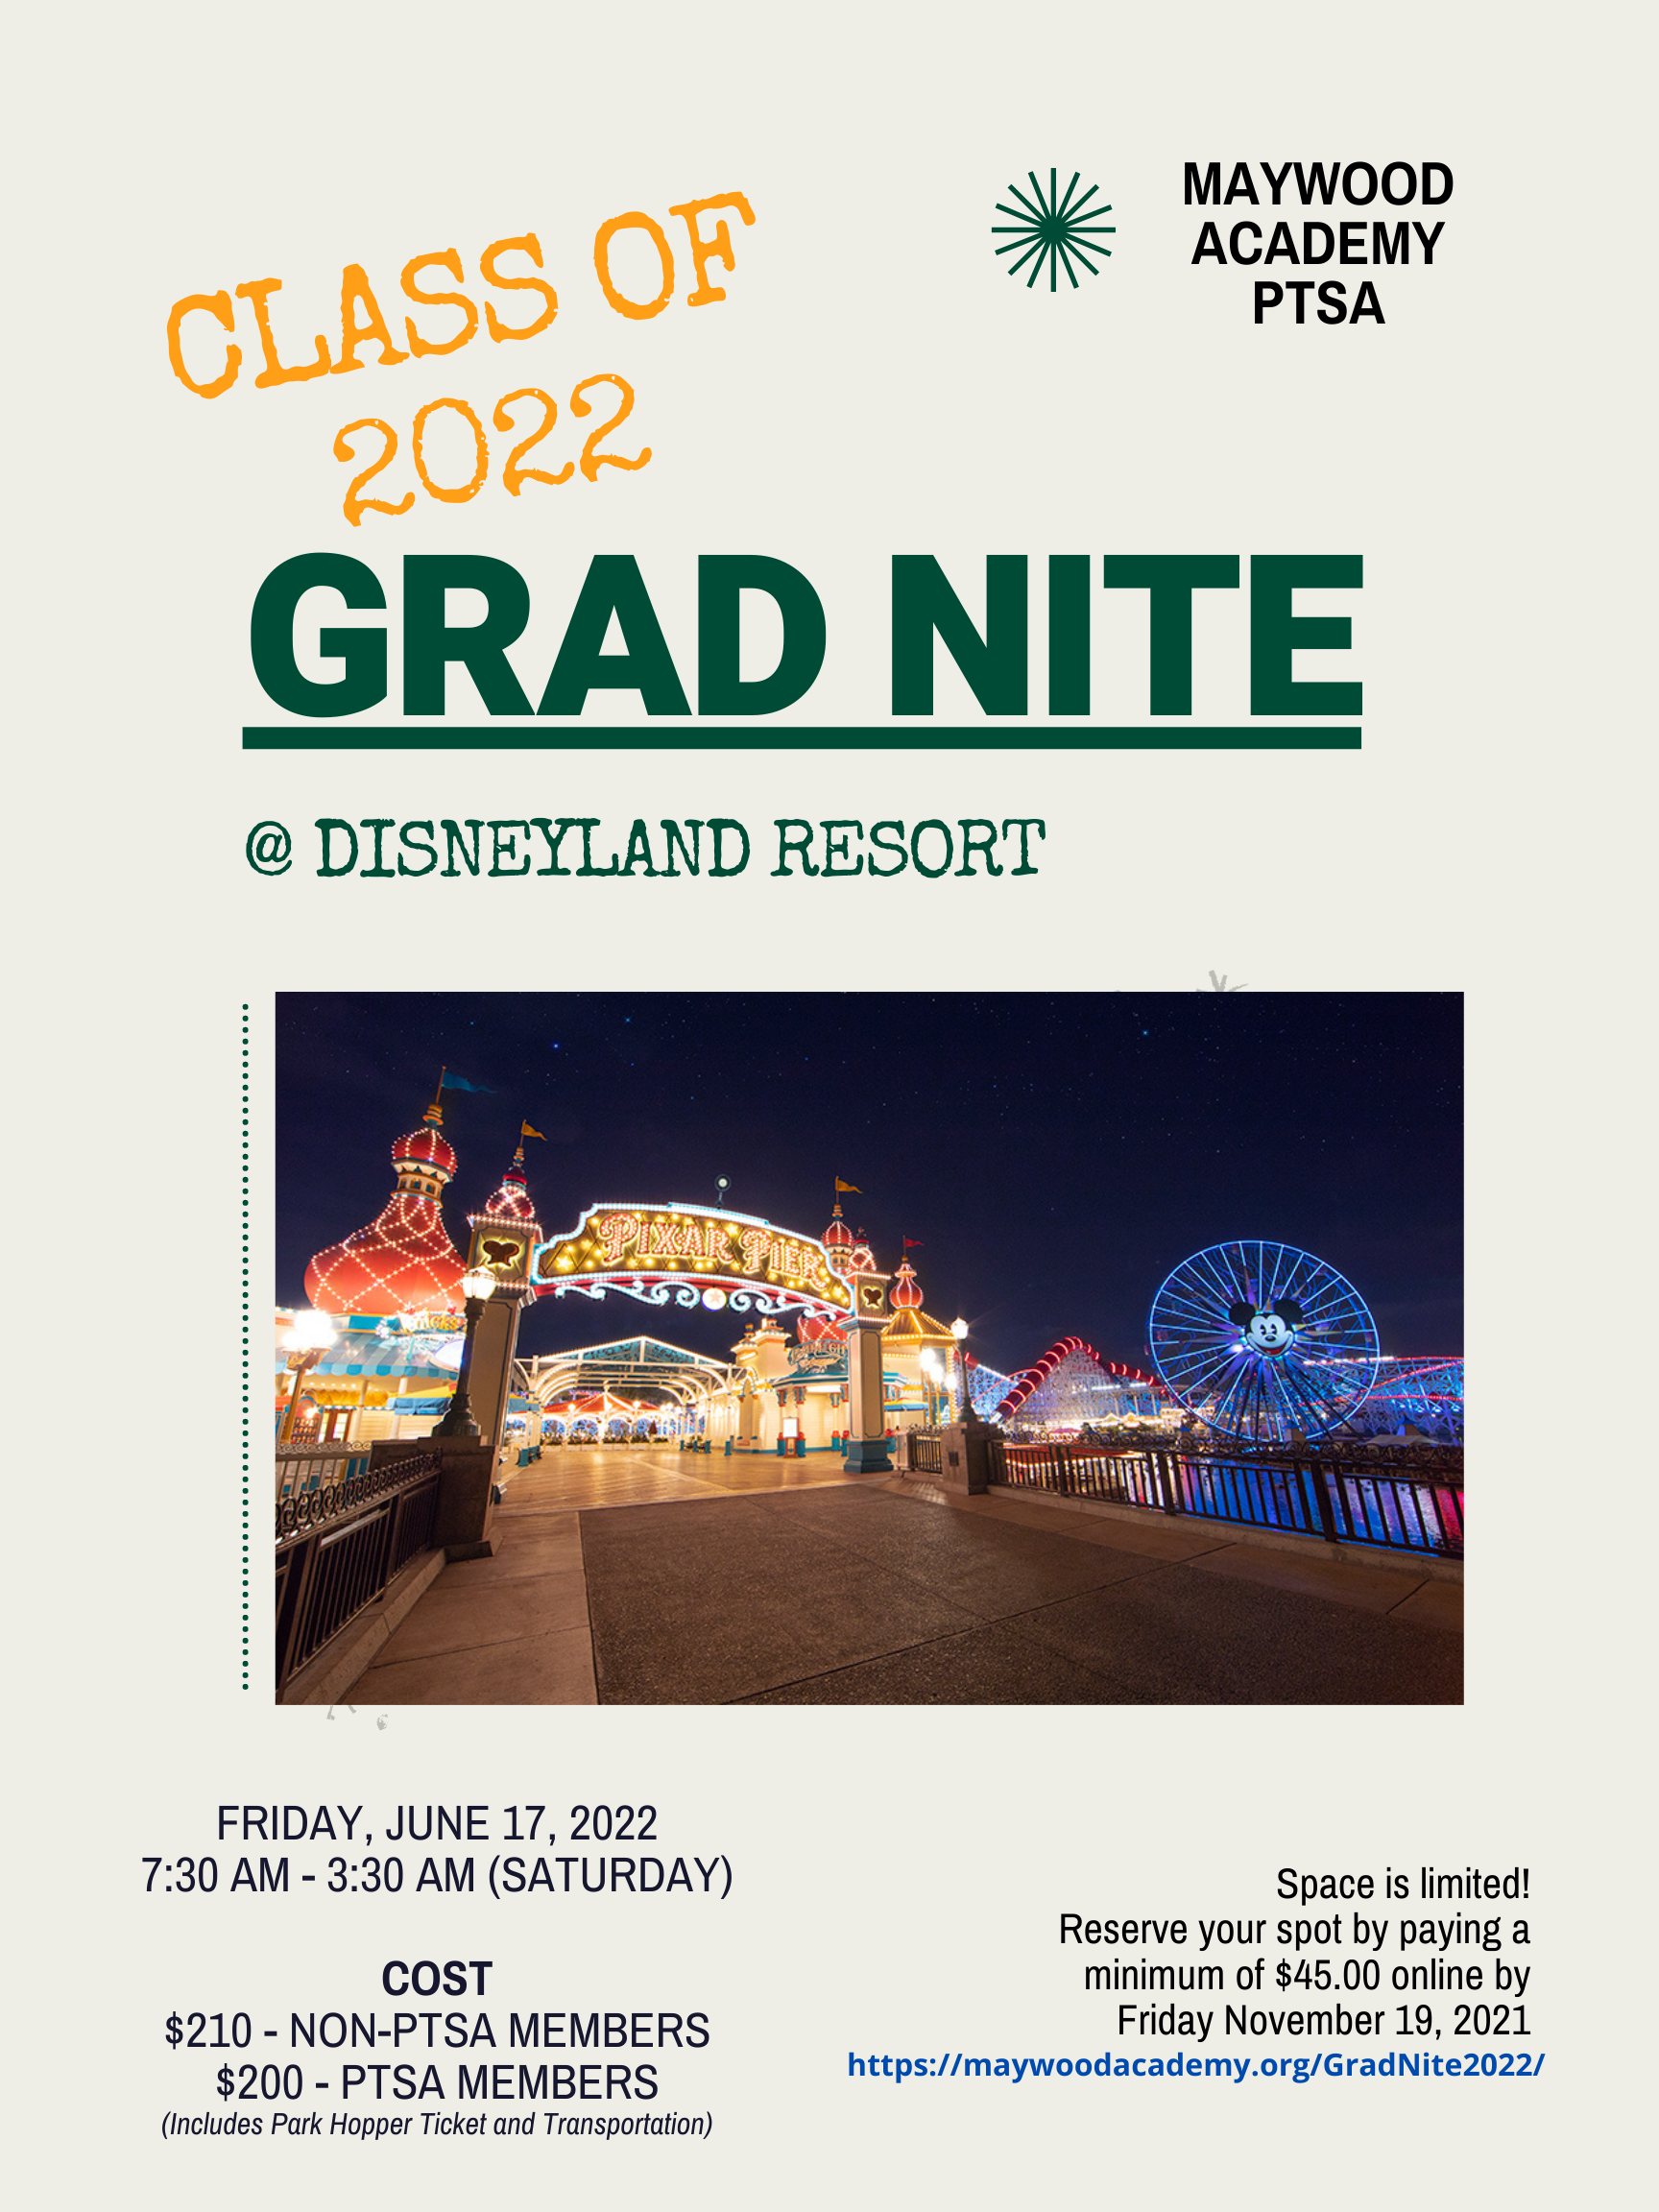 Grad Nite Flyer with Pixar Pier Picture